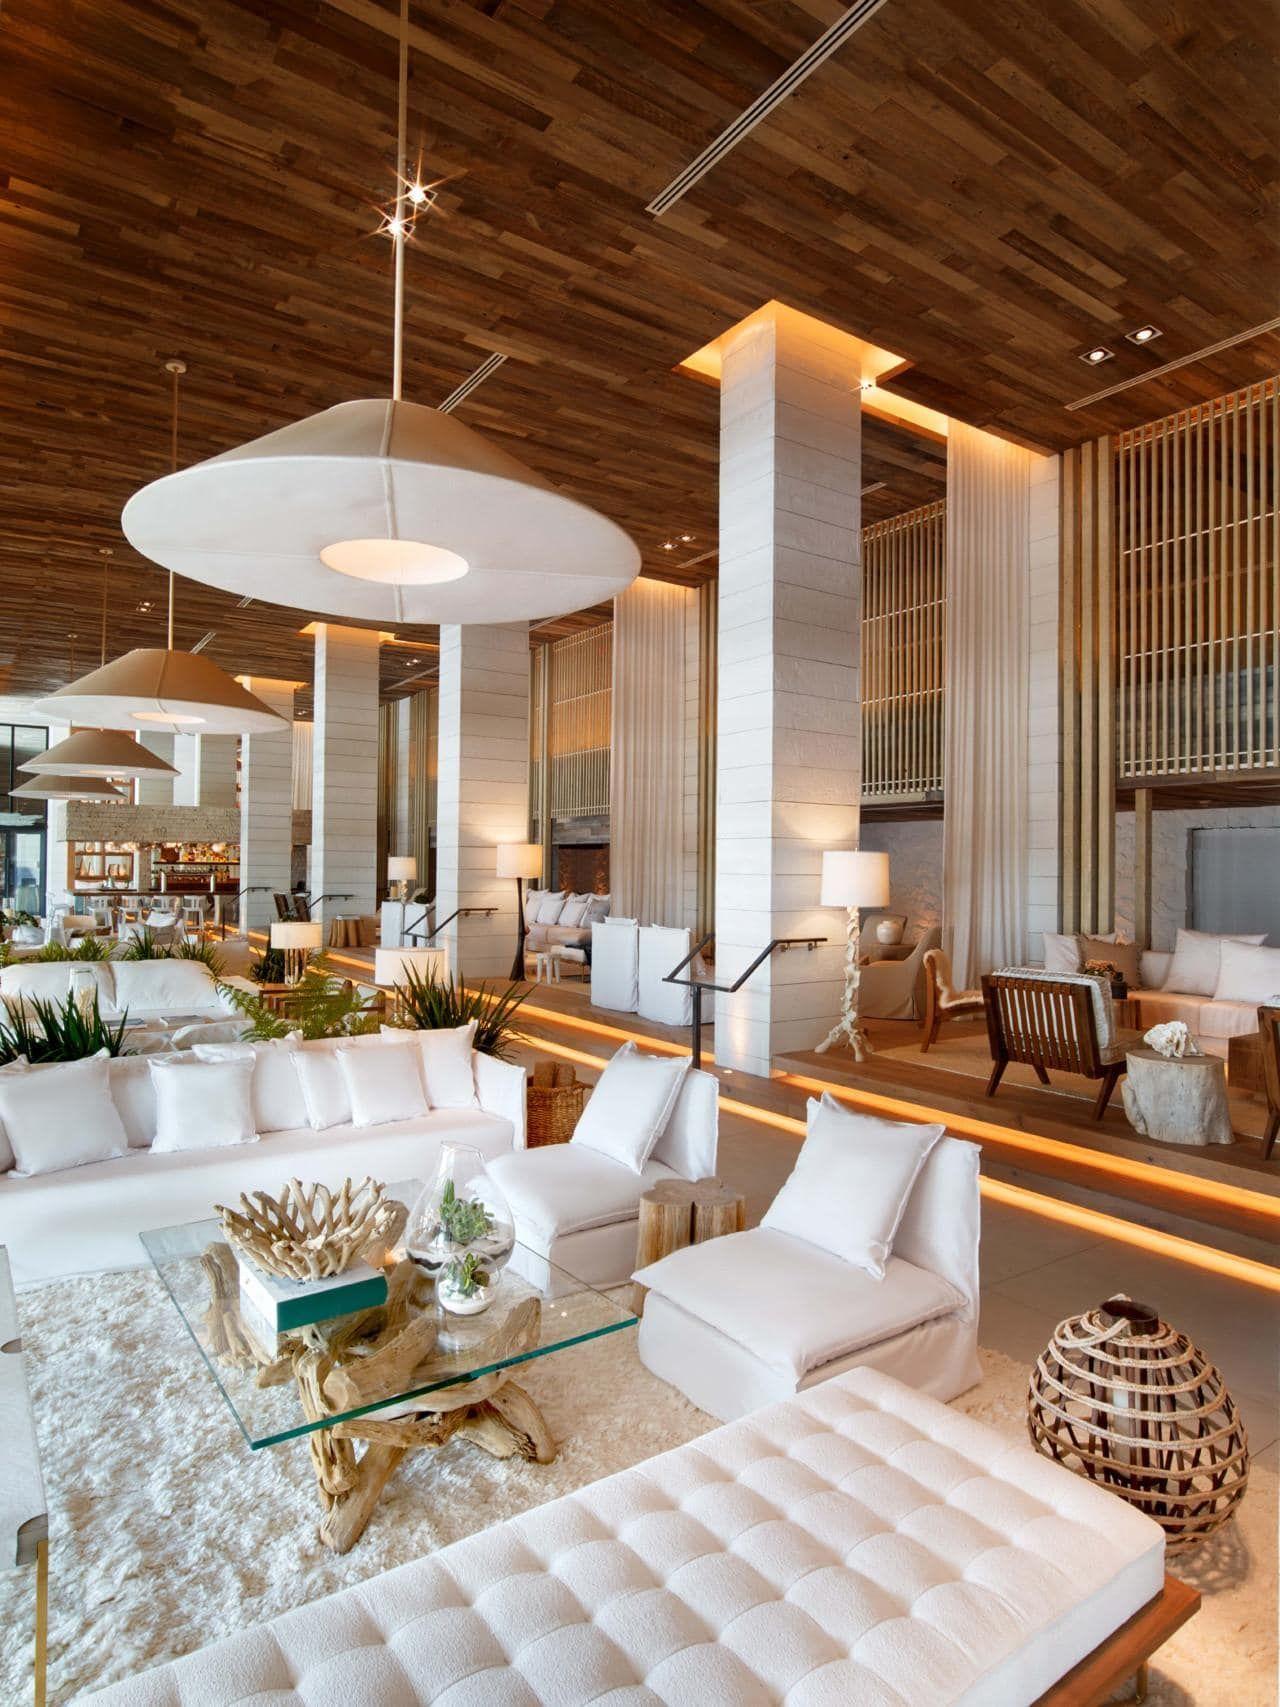 hotel lobby miami inside hotels interior interiors lounge lobbies vogue modern bar living decor davis suites grand studio casa destination